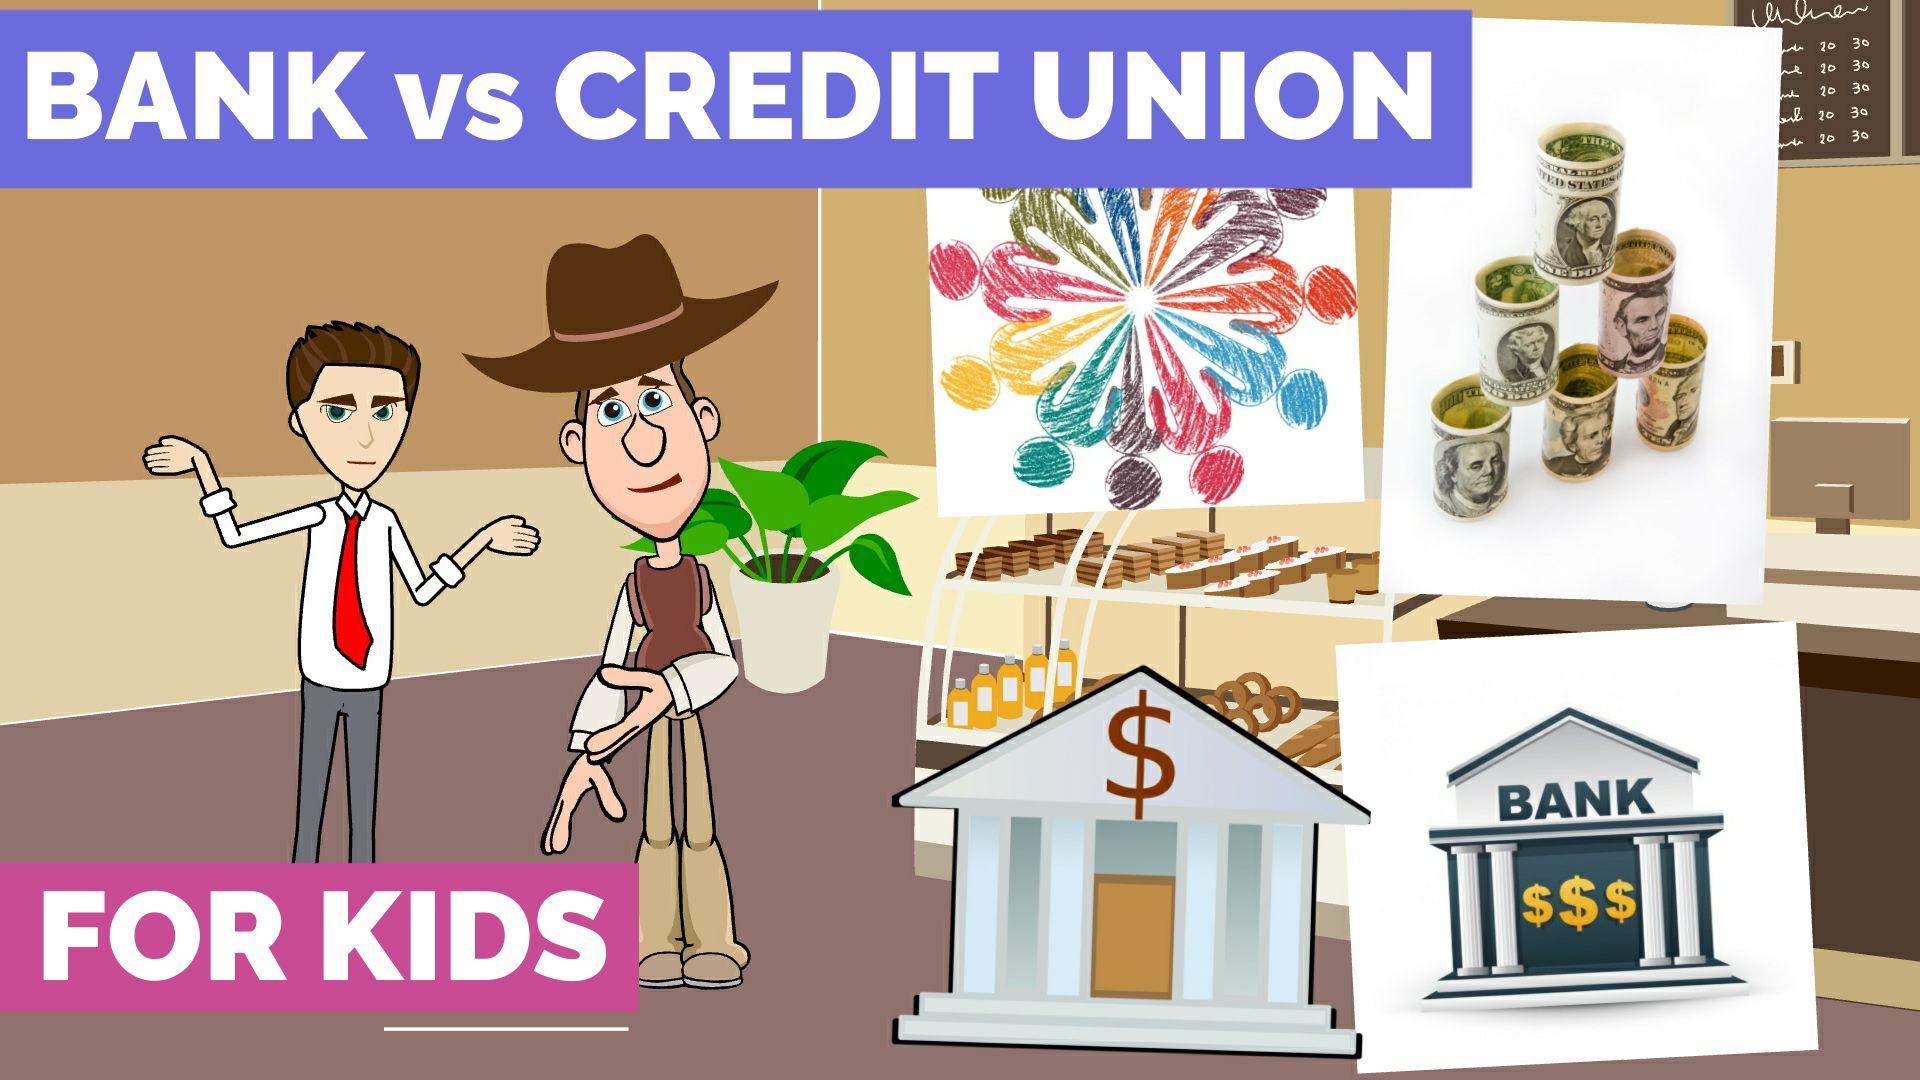 Banks vs Credit Unions